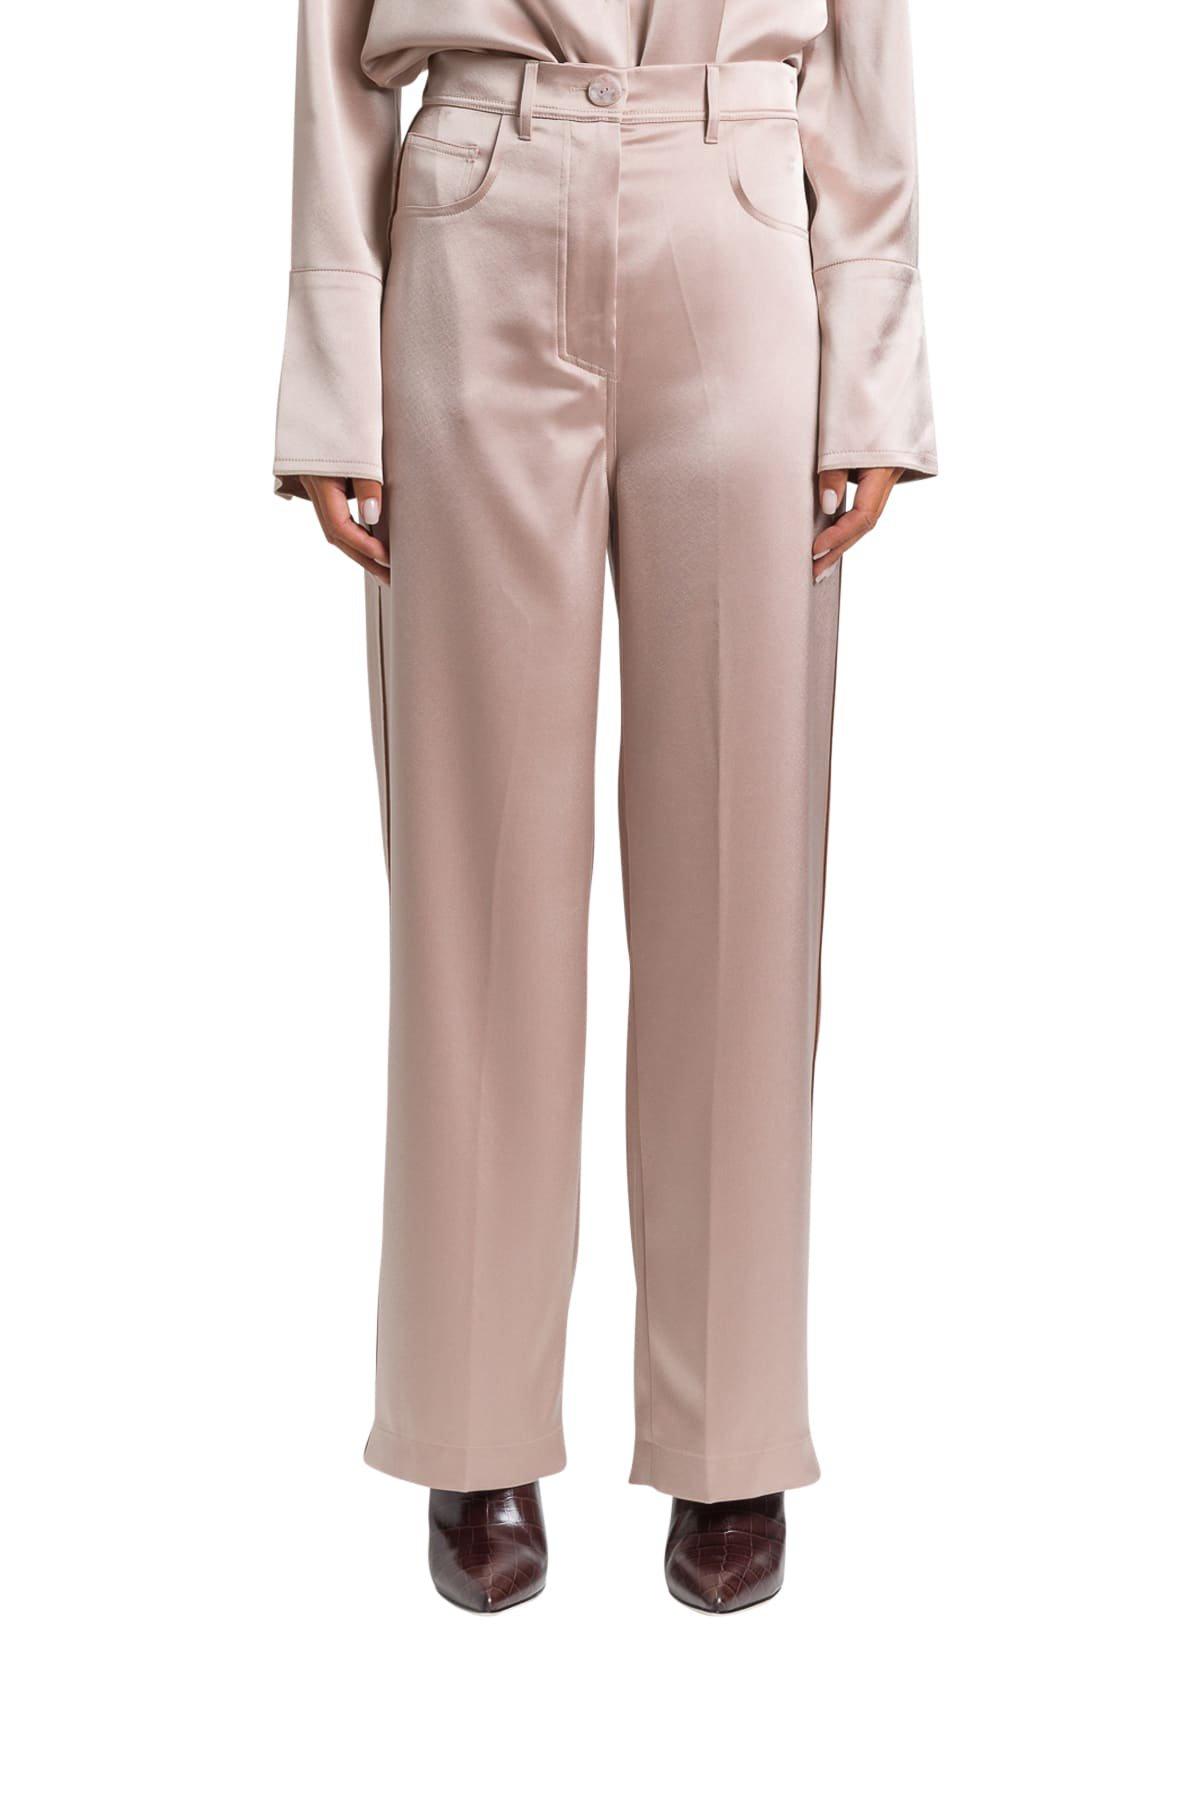 Nanushka Satin Wide-leg Trousers